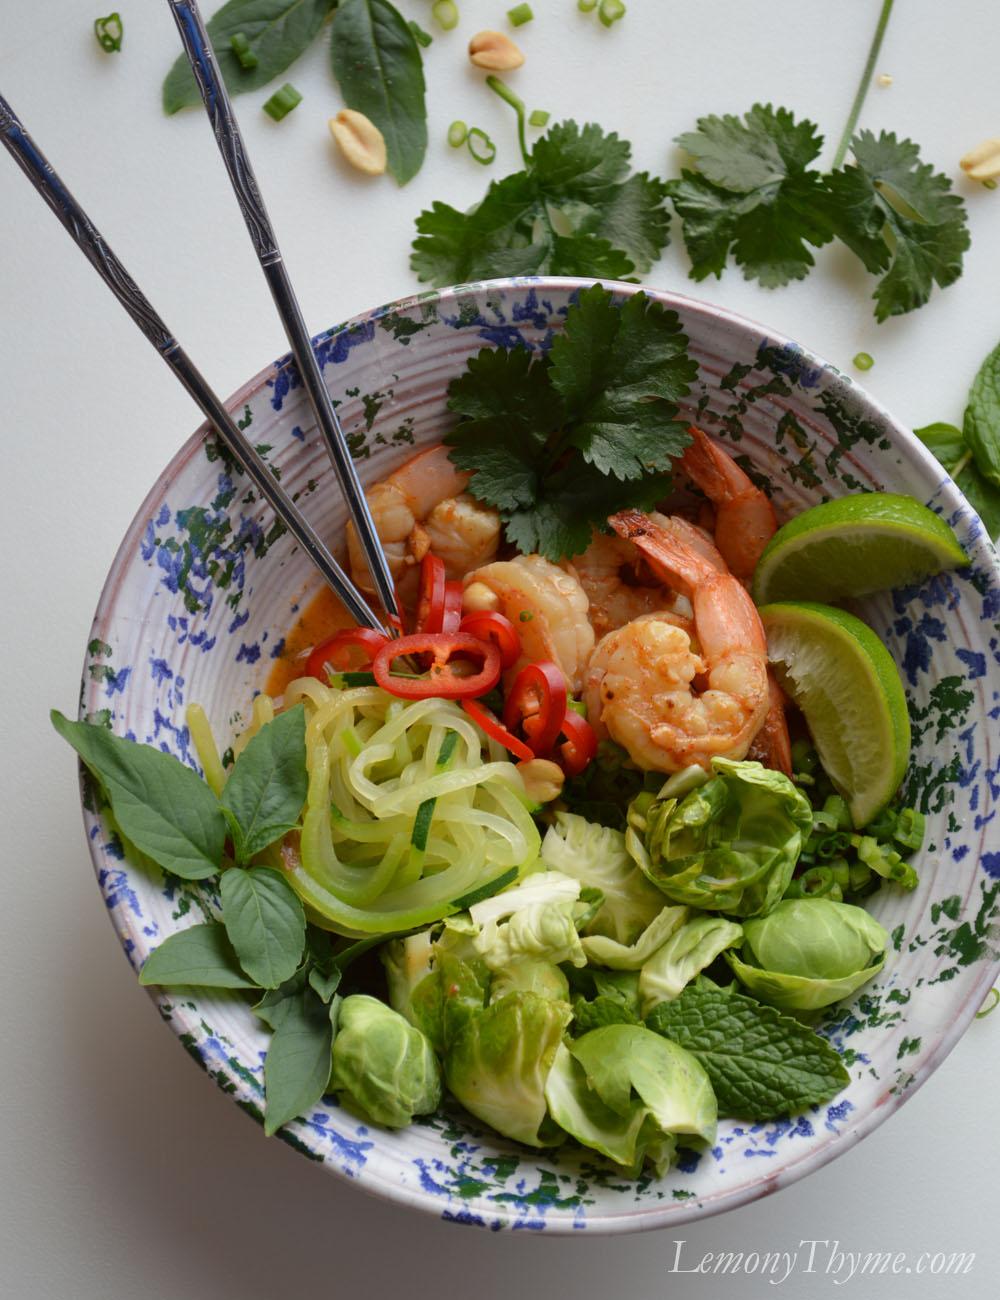 ... hungry. I'm proposing Spicy Shrimp Thai Buddha Bowls all around